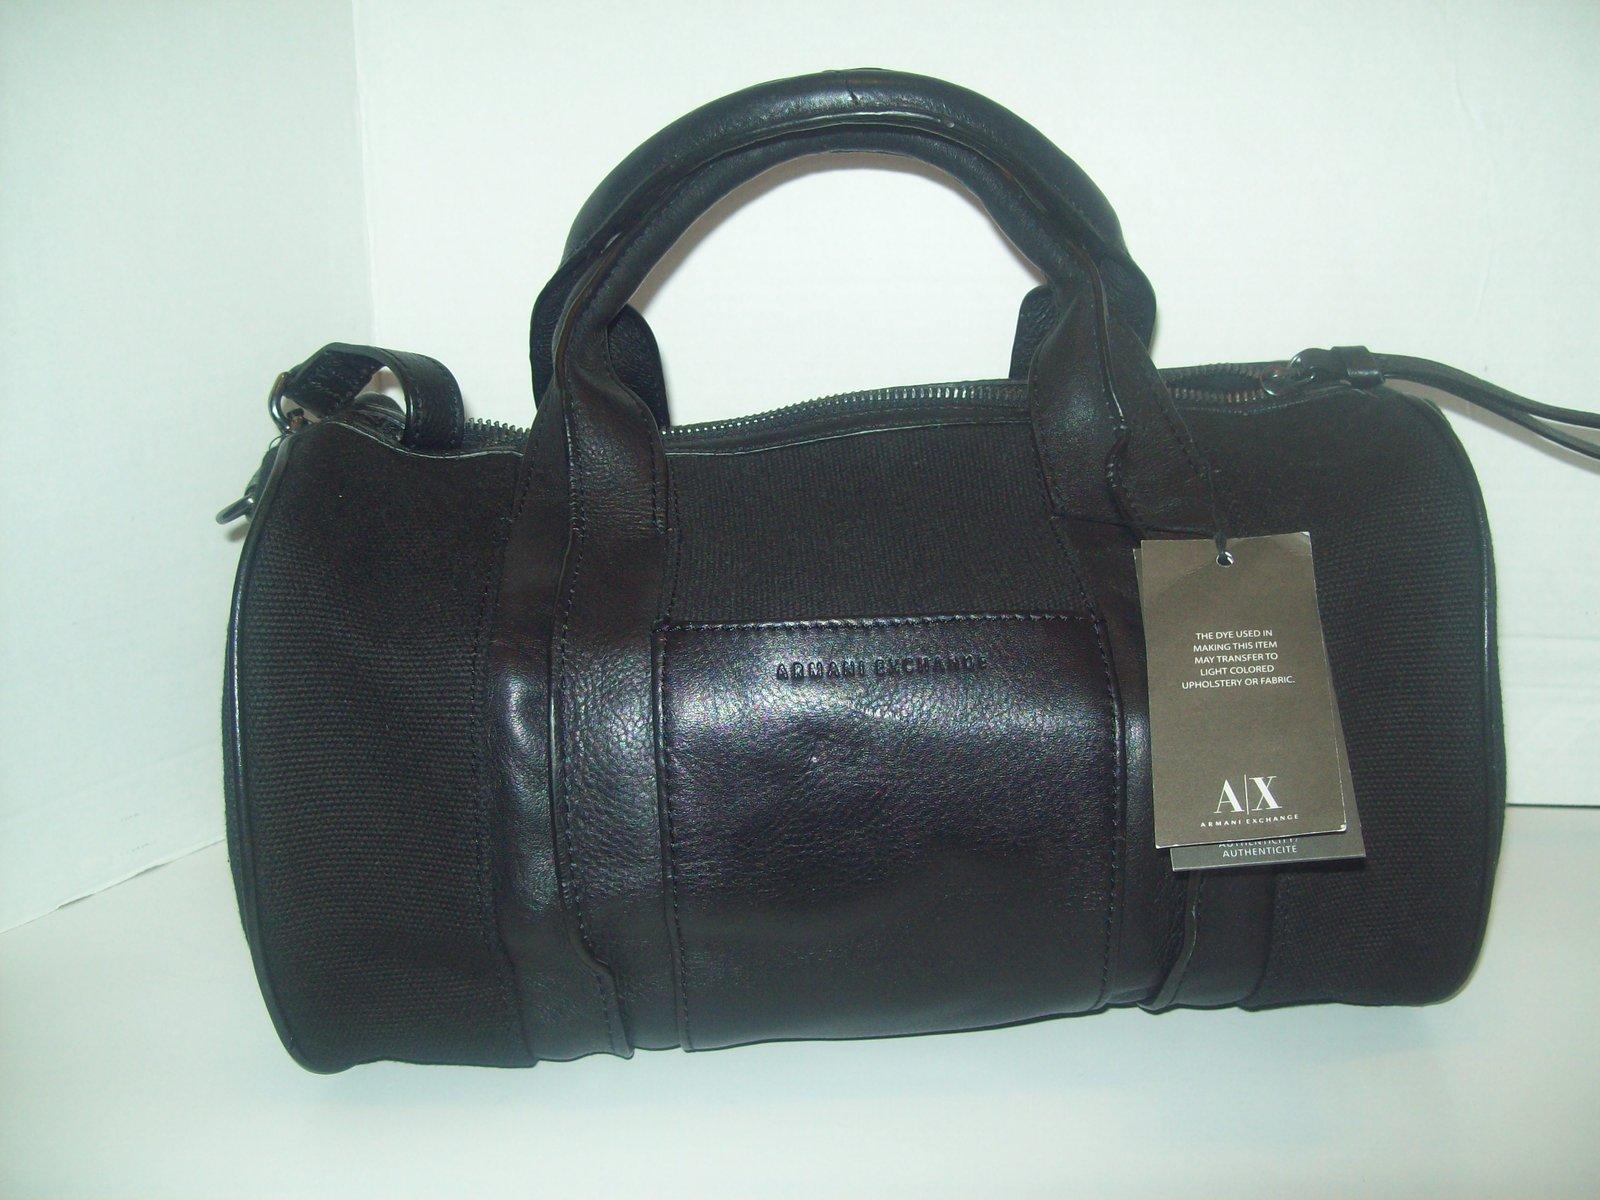 0dec46eb6f71 Armani exchange mixed media satchel bag hi end thrift store JPG 1000x750 Armani  exchange satchel